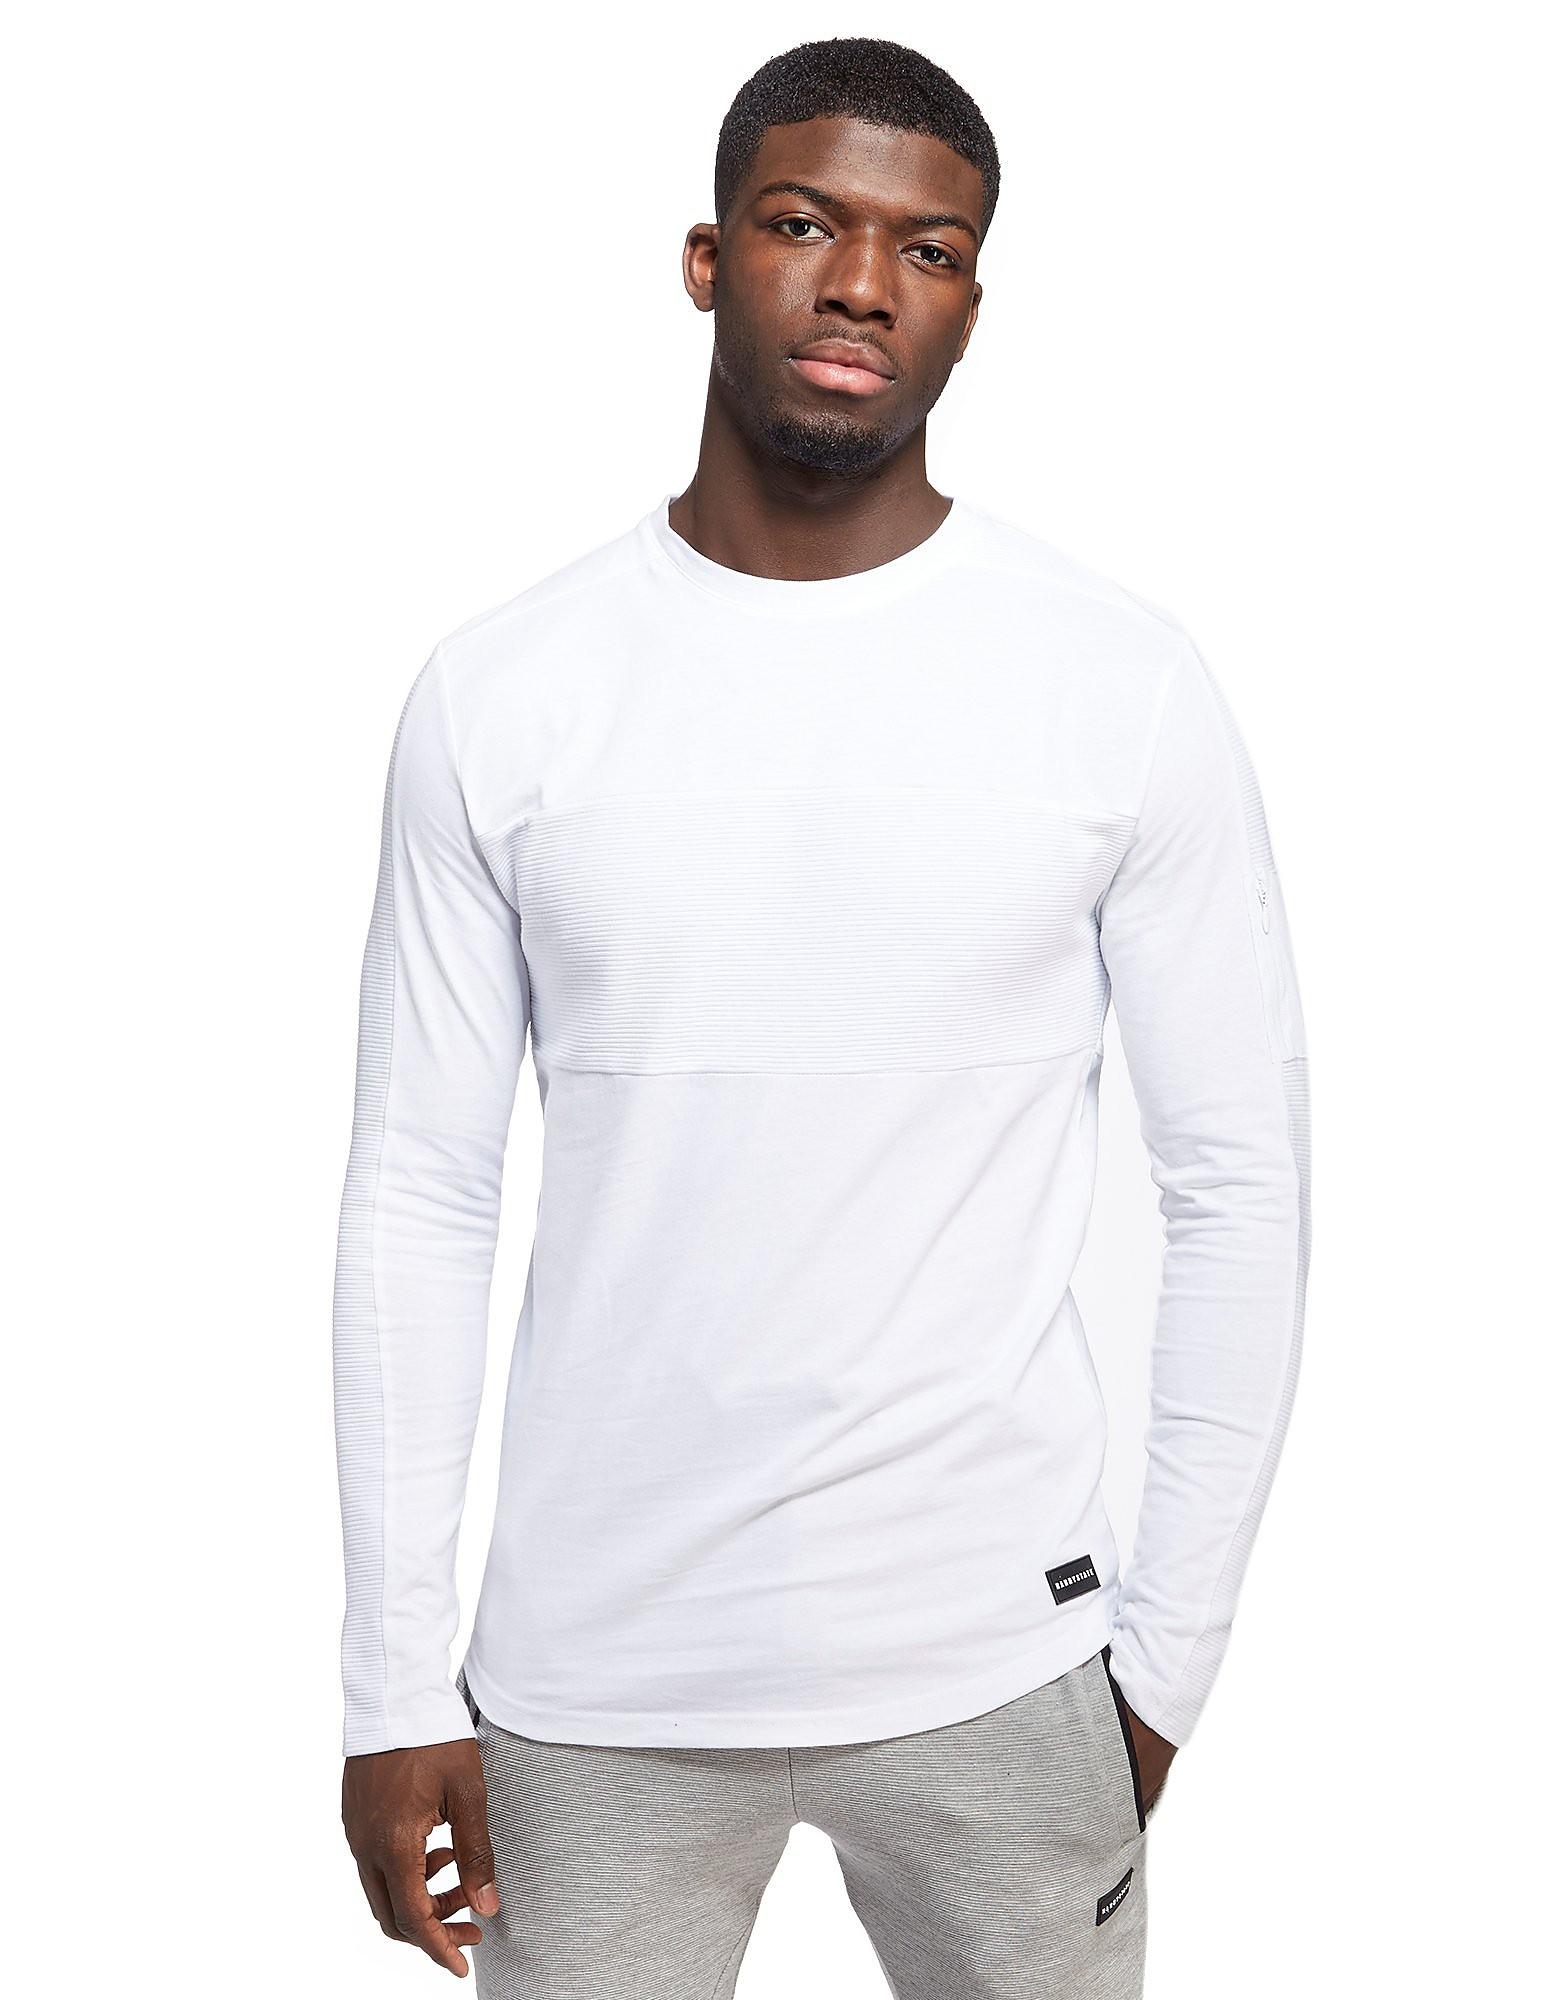 Nanny State Gears Long Sleeve T-Shirt